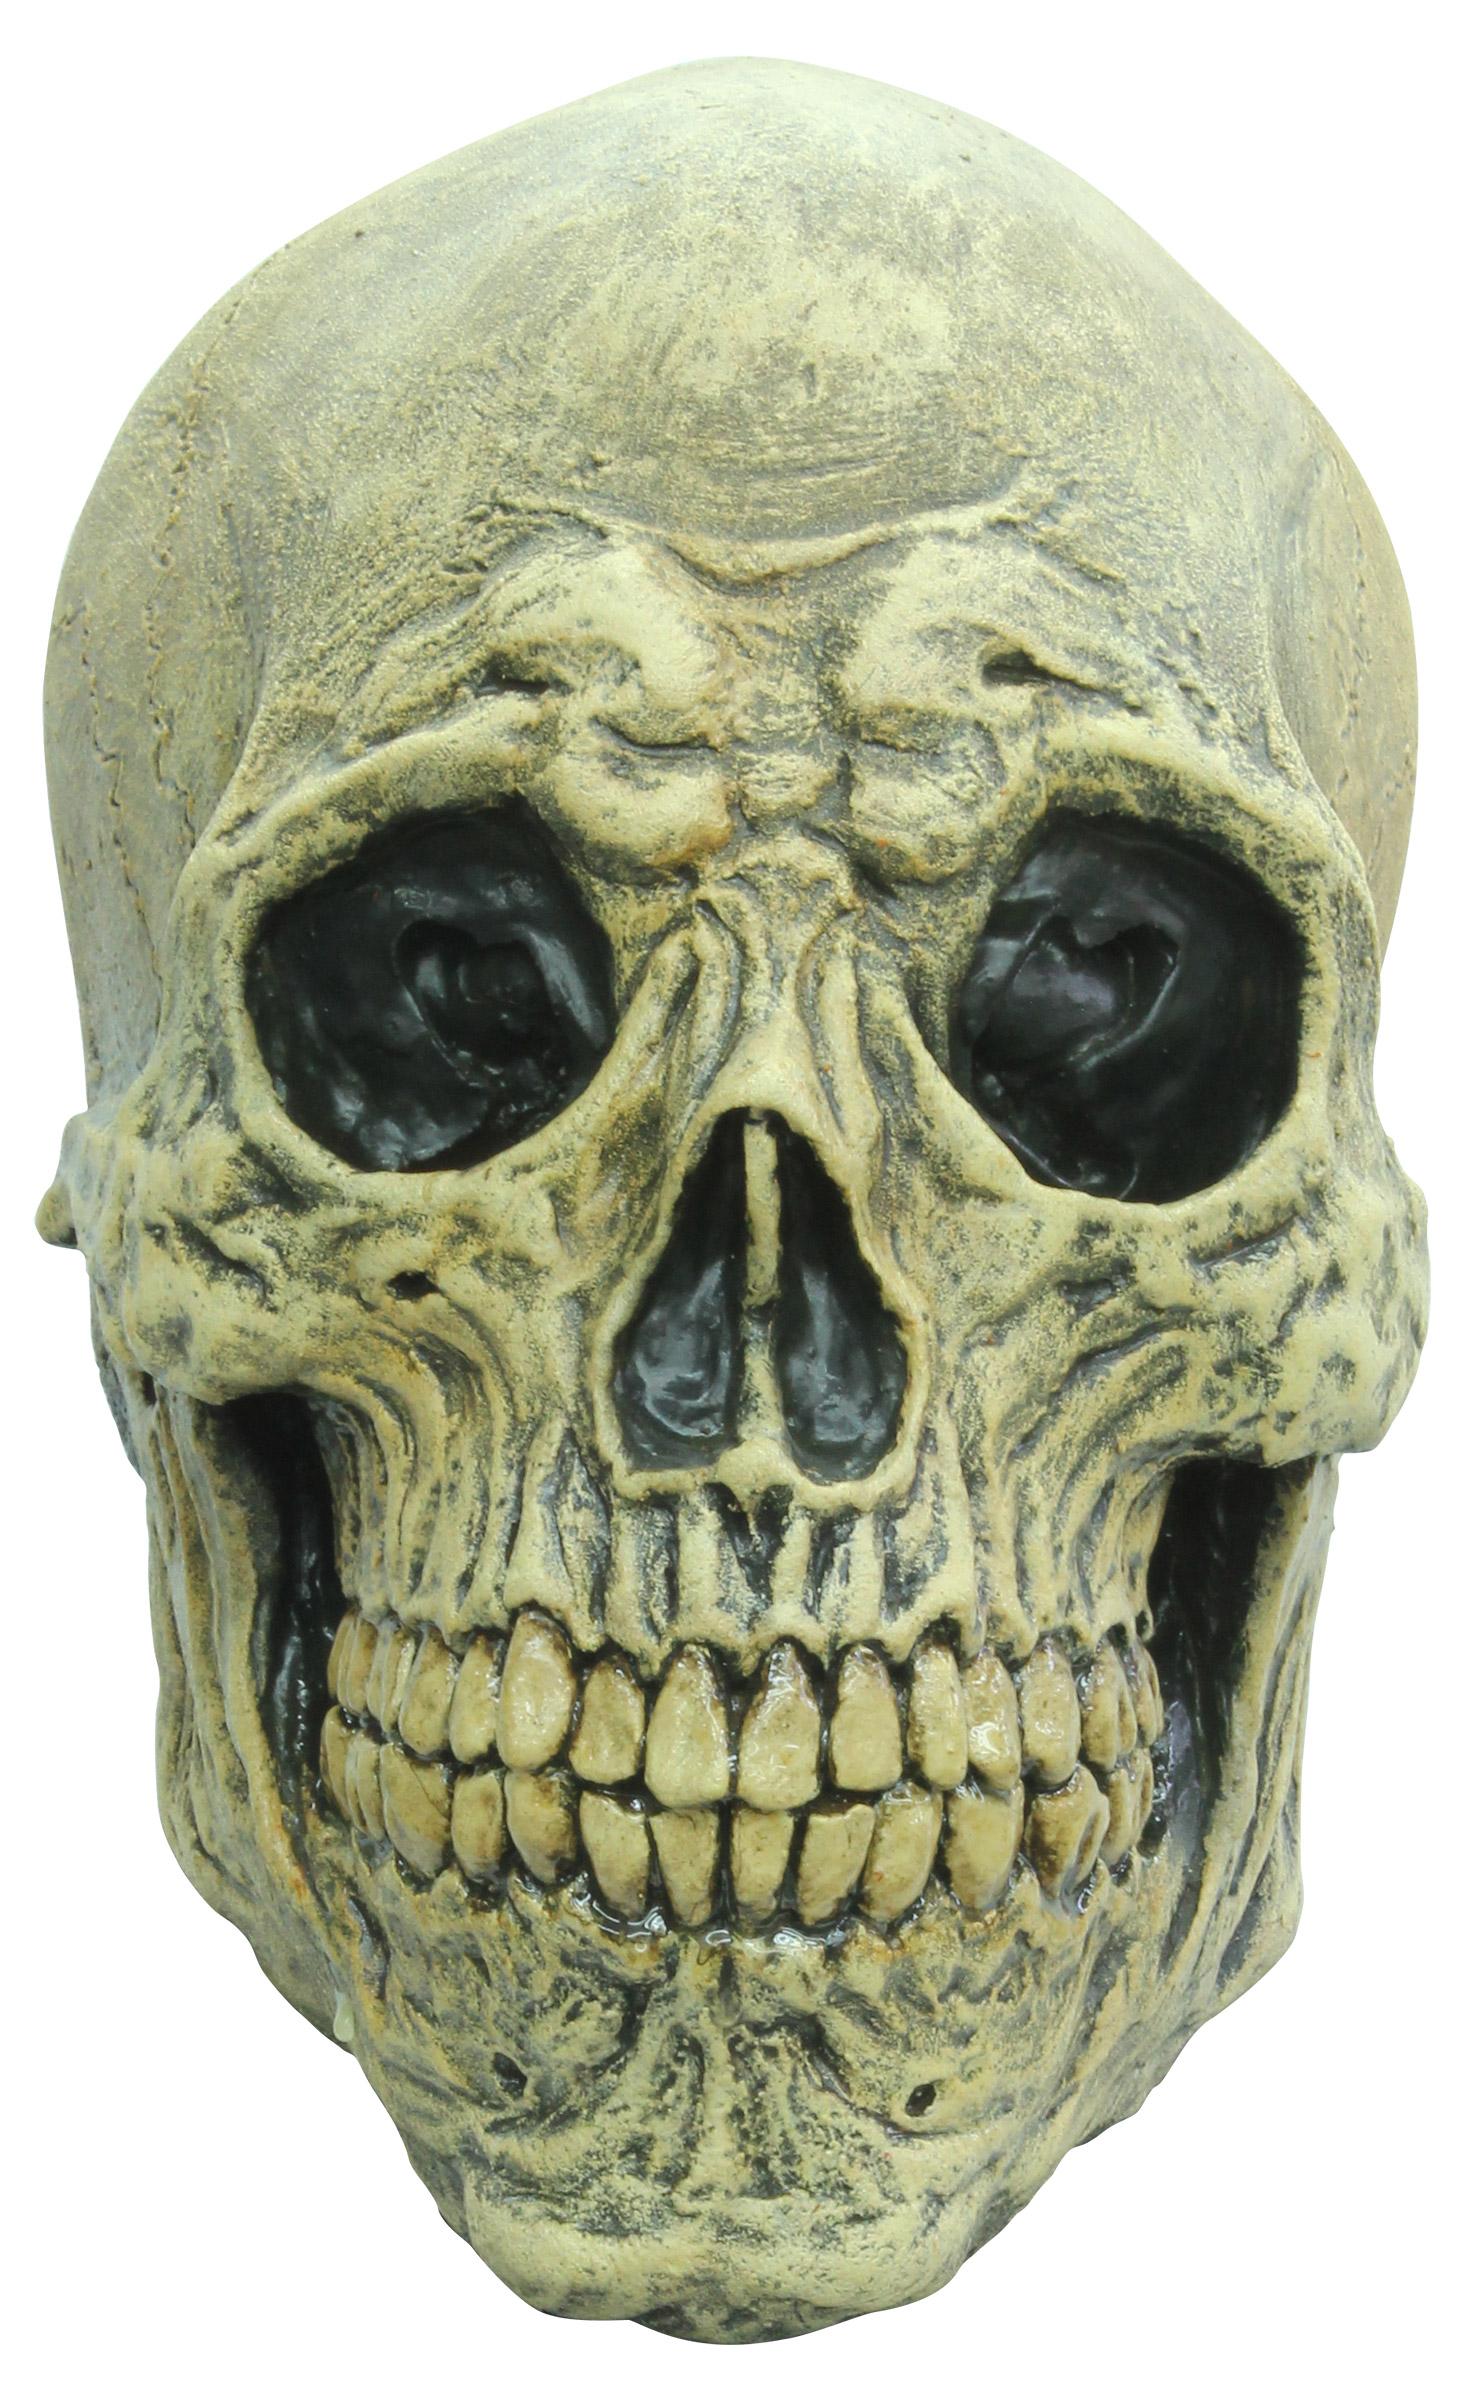 halloween gruselige skelett maske f r erwachsene masken und g nstige faschingskost me vegaoo. Black Bedroom Furniture Sets. Home Design Ideas